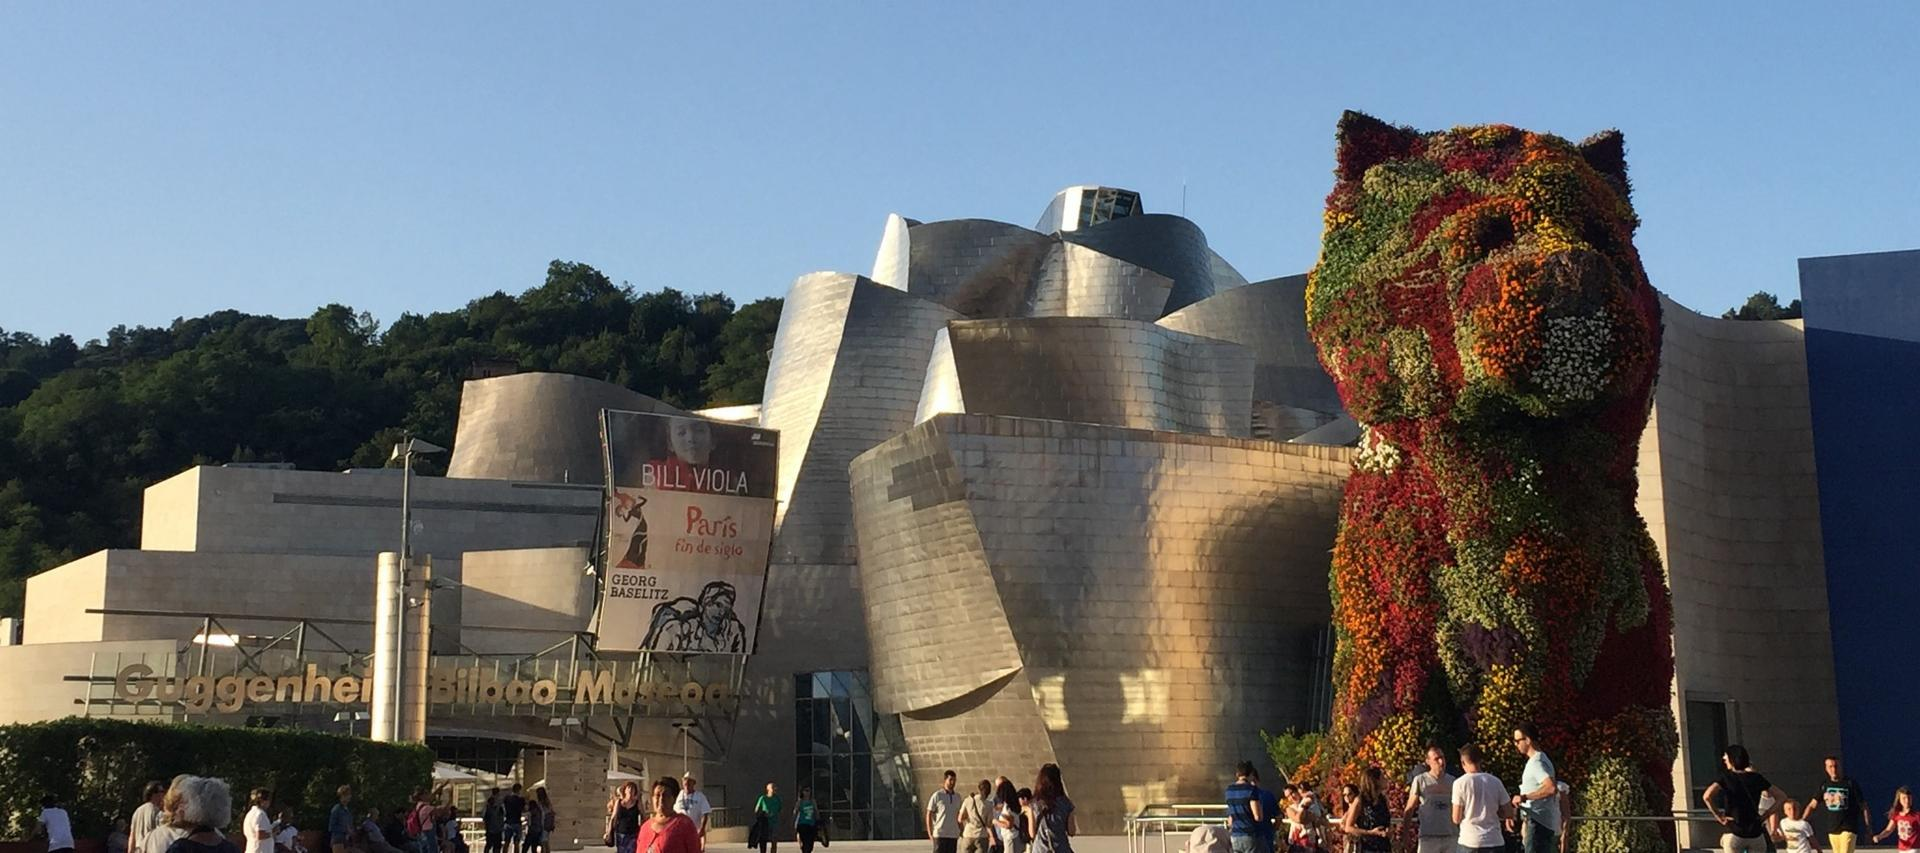 Guggeheim Museum in Bilbao, Spain